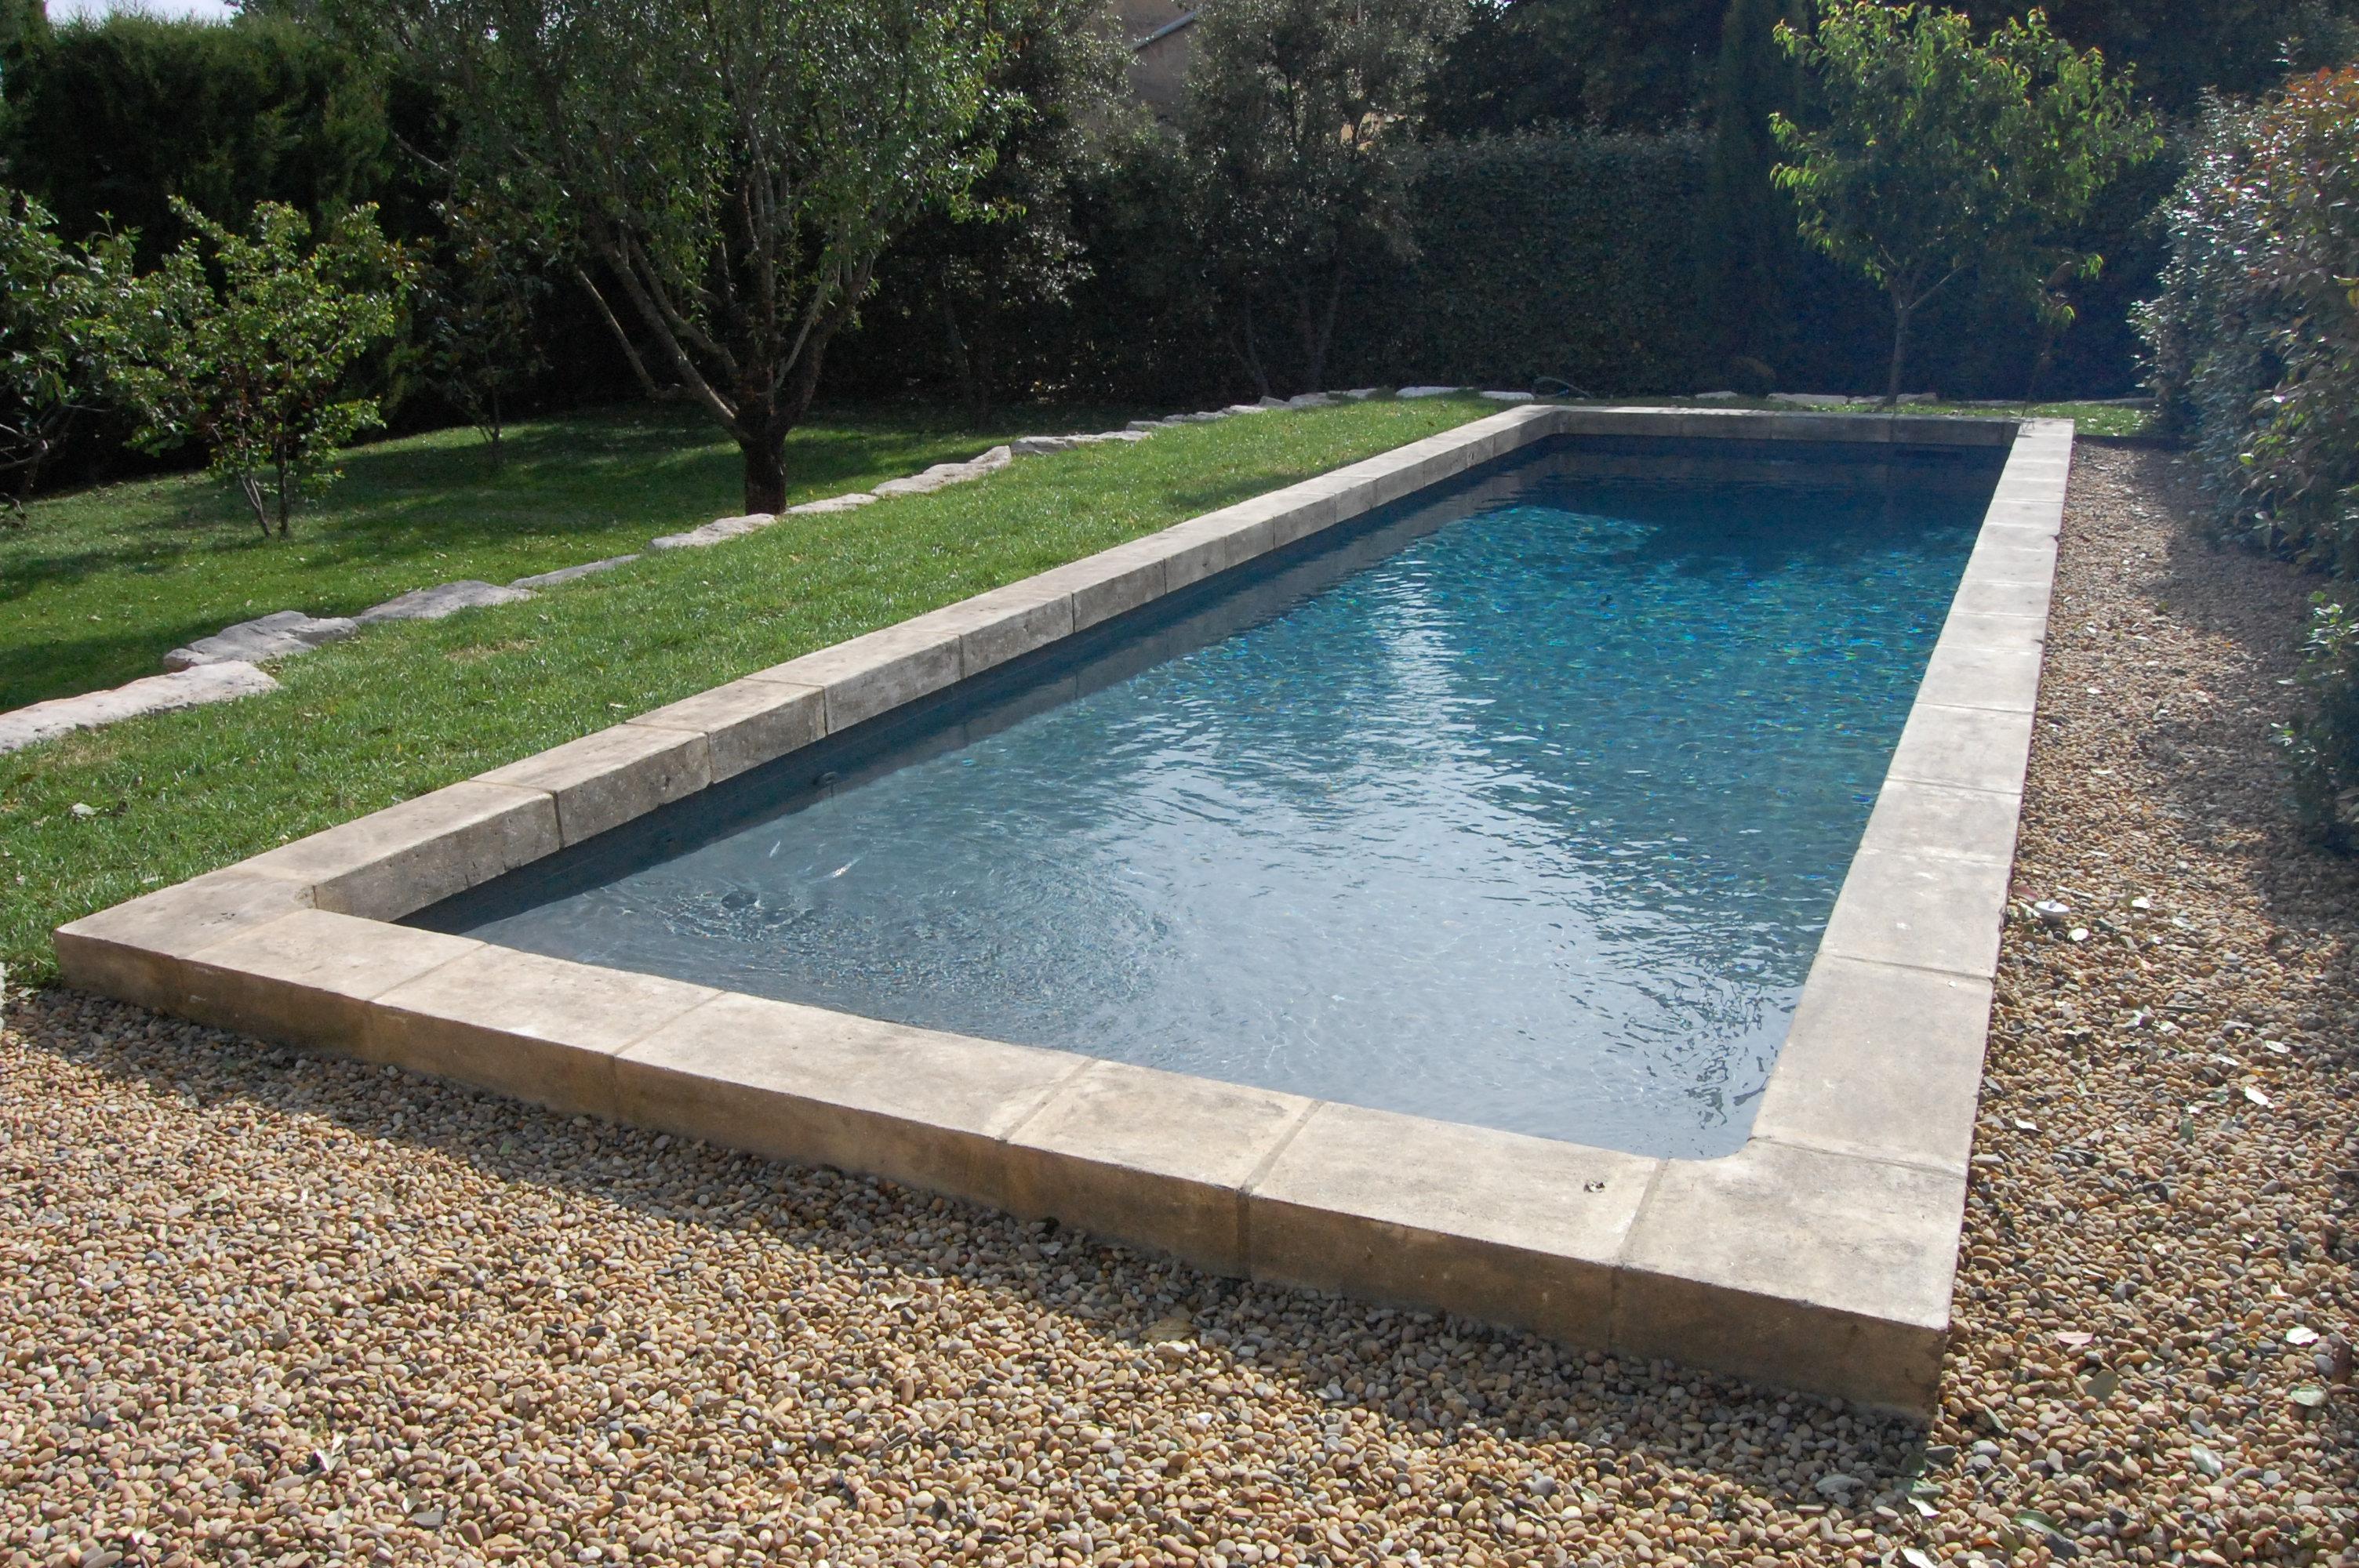 Terrasse piscine sur gravier nos conseils for Blanc gravier piscine